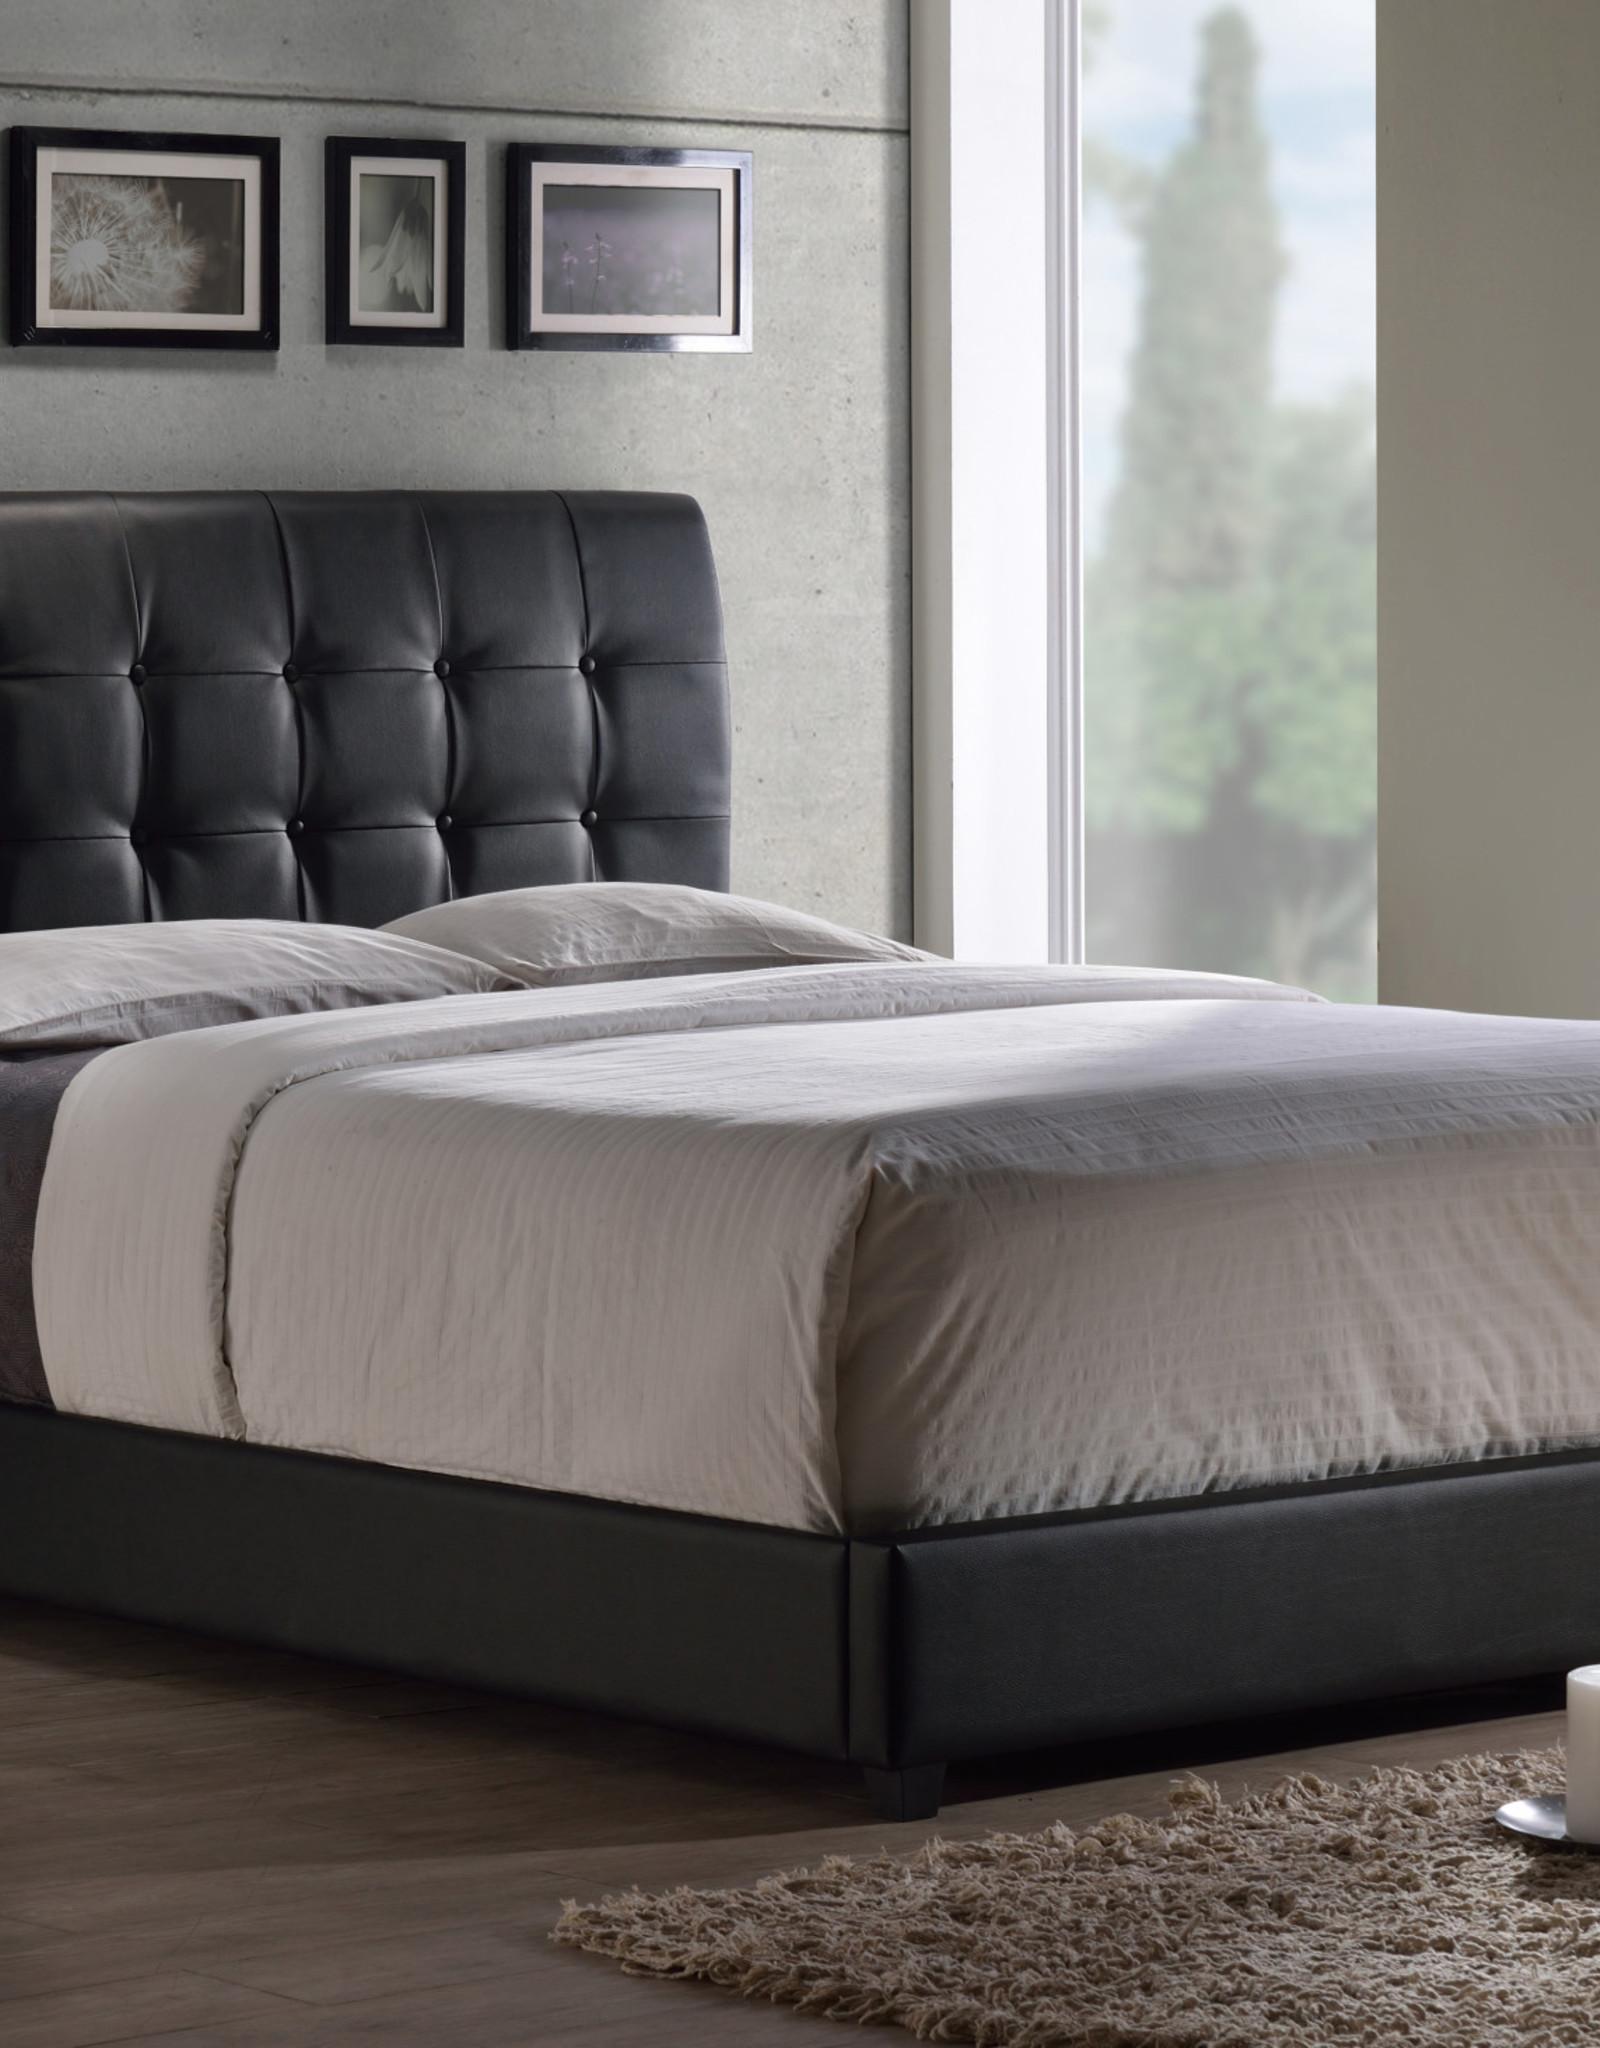 Lusso Bed Black Includes Headboard Footboard And Rails Magic Sleeper